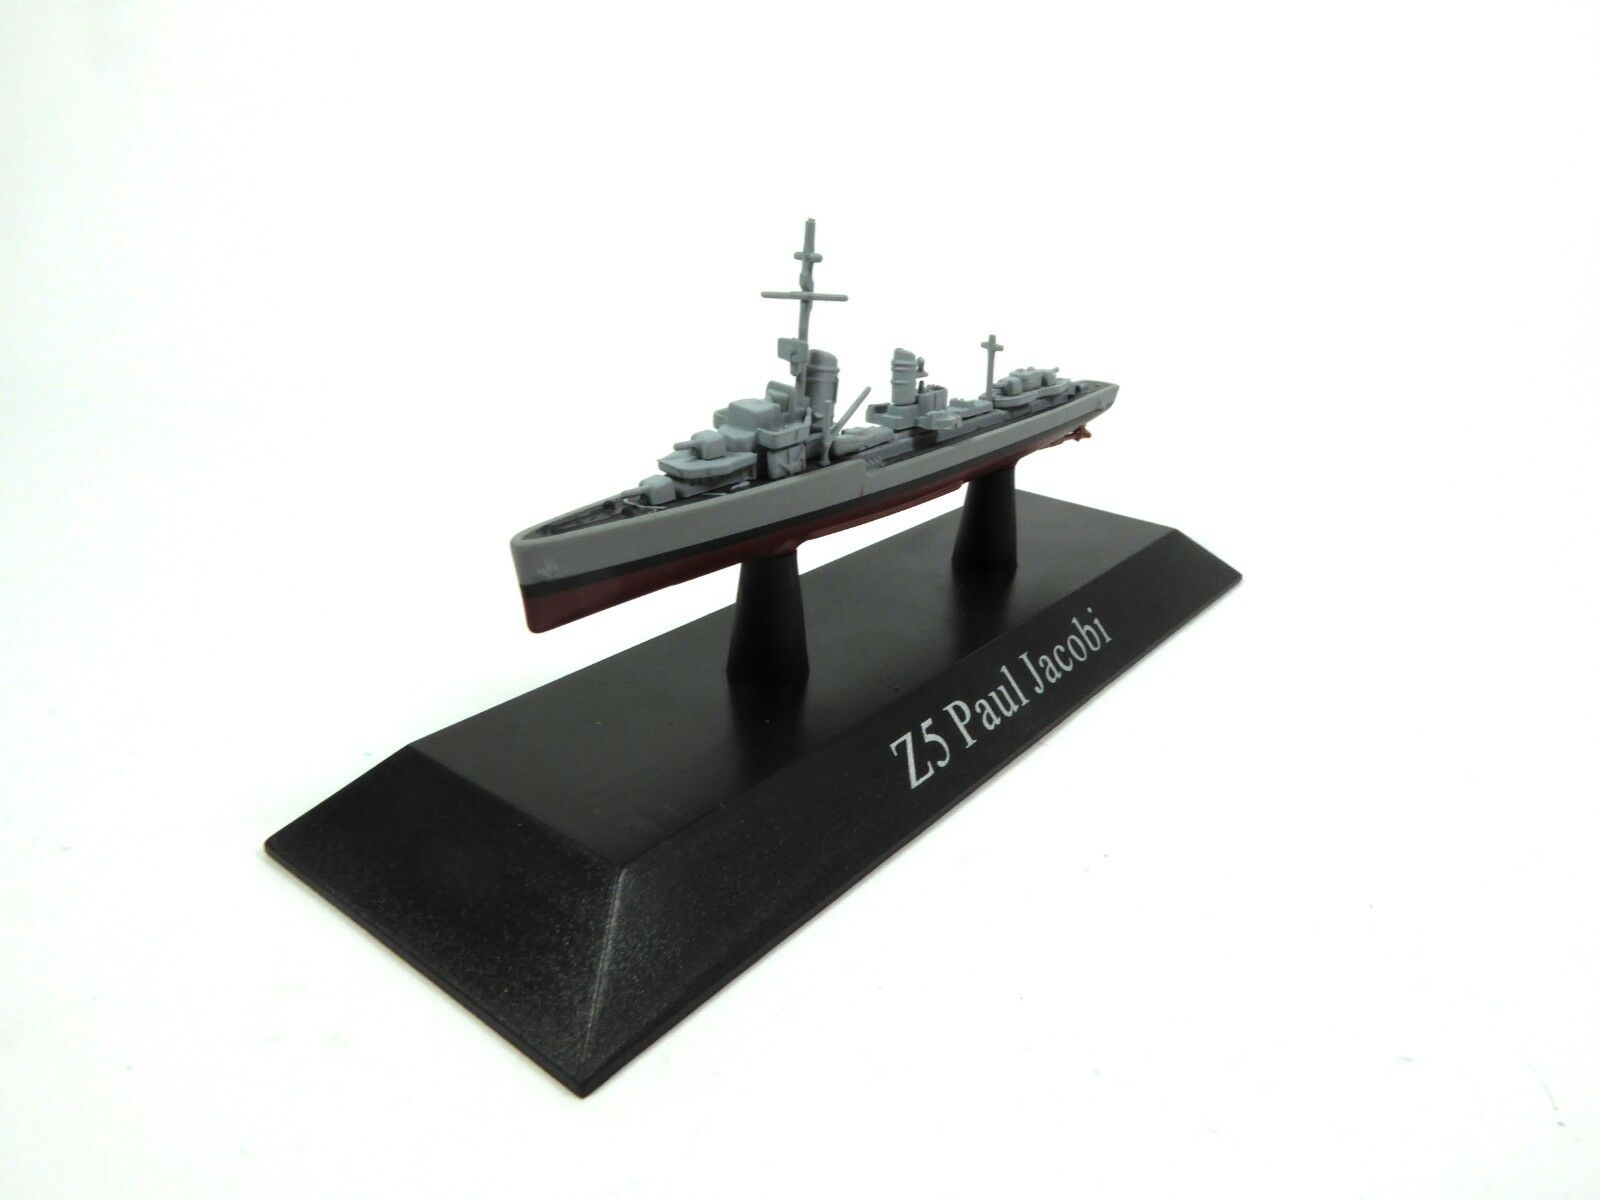 Z5 Paul Jakobi Jakobi Jakobi Type 1934A - 1 1250 Navire de guerre IXO Destroyer Militaire WS56 1c83b1